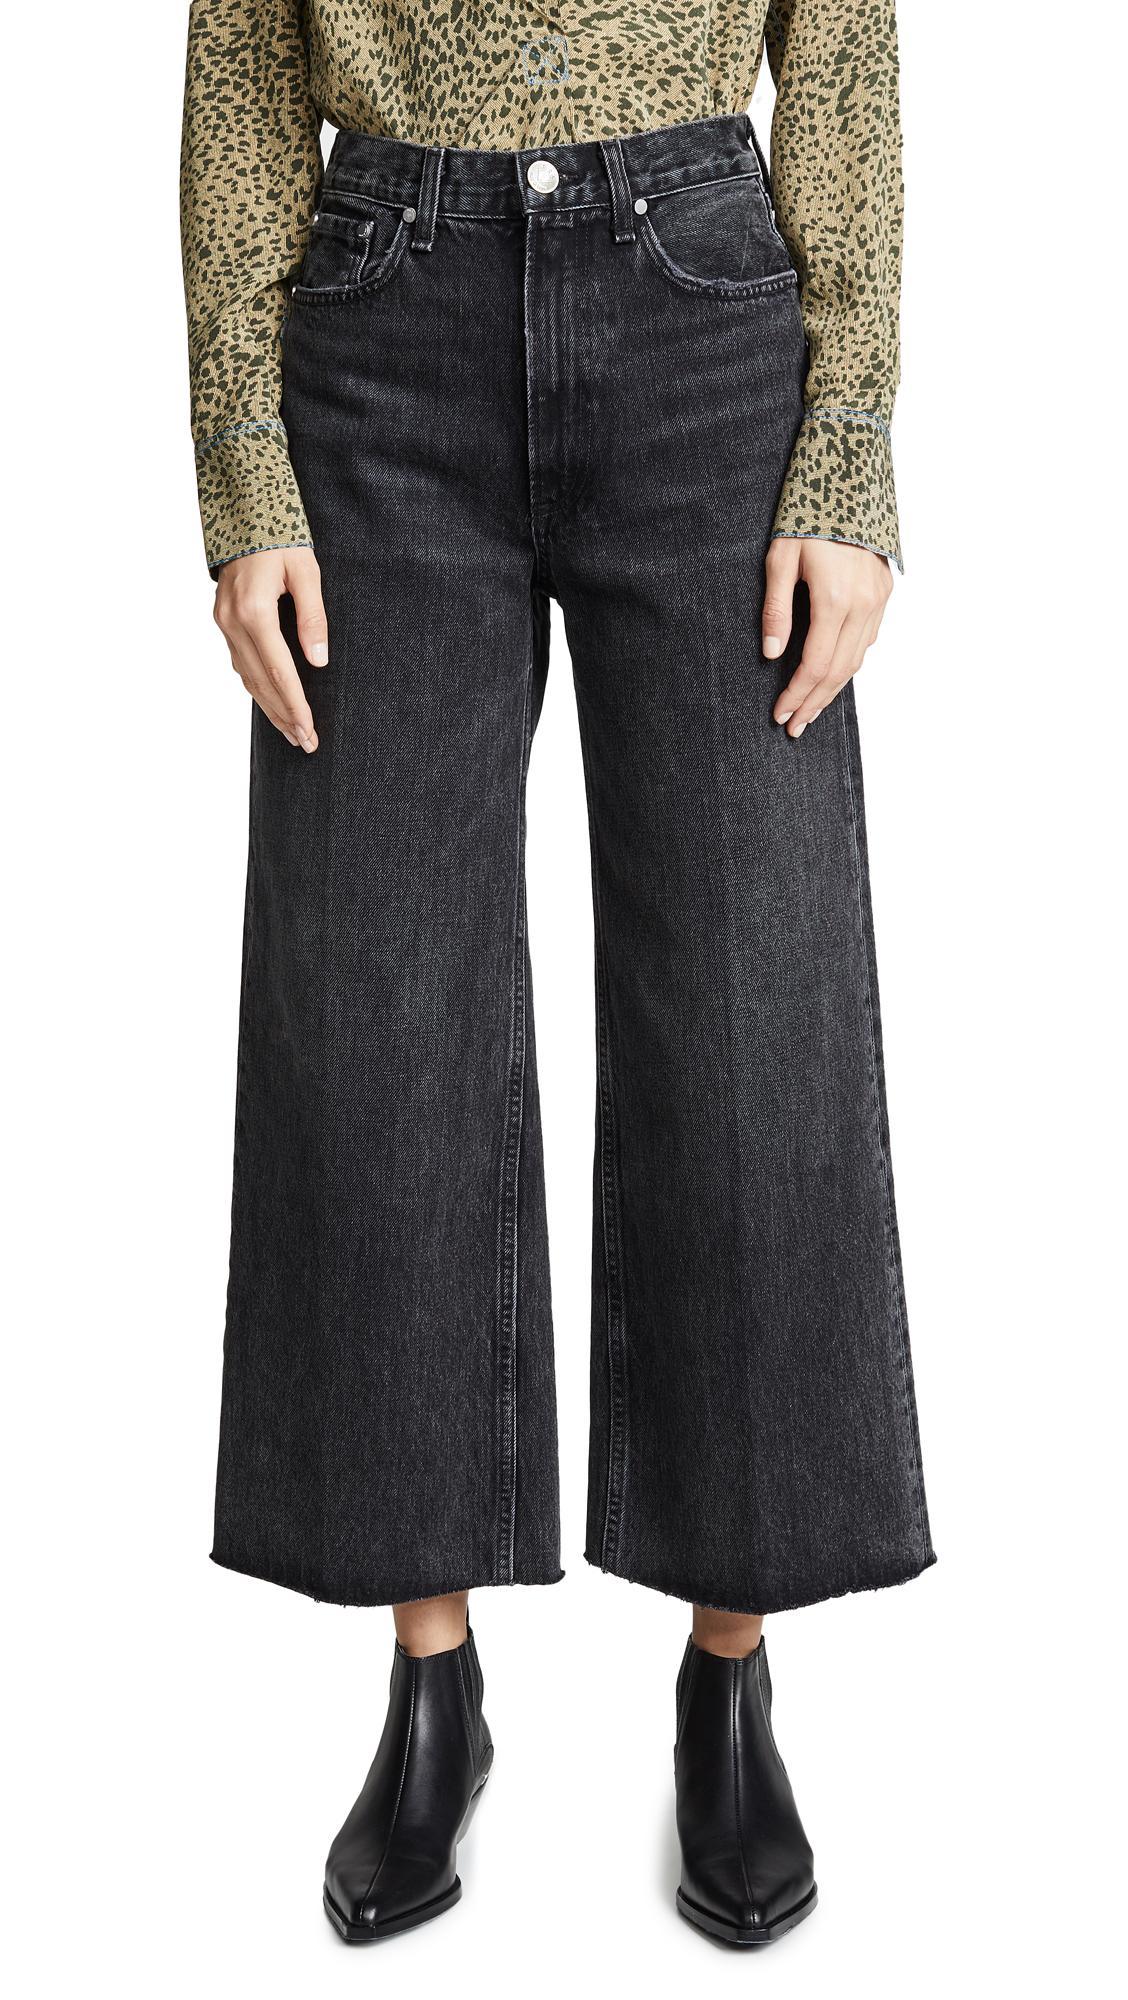 Rag & Bone Haru Wide Leg High Waist Nonstretch Cotton Jeans In Asa Wash